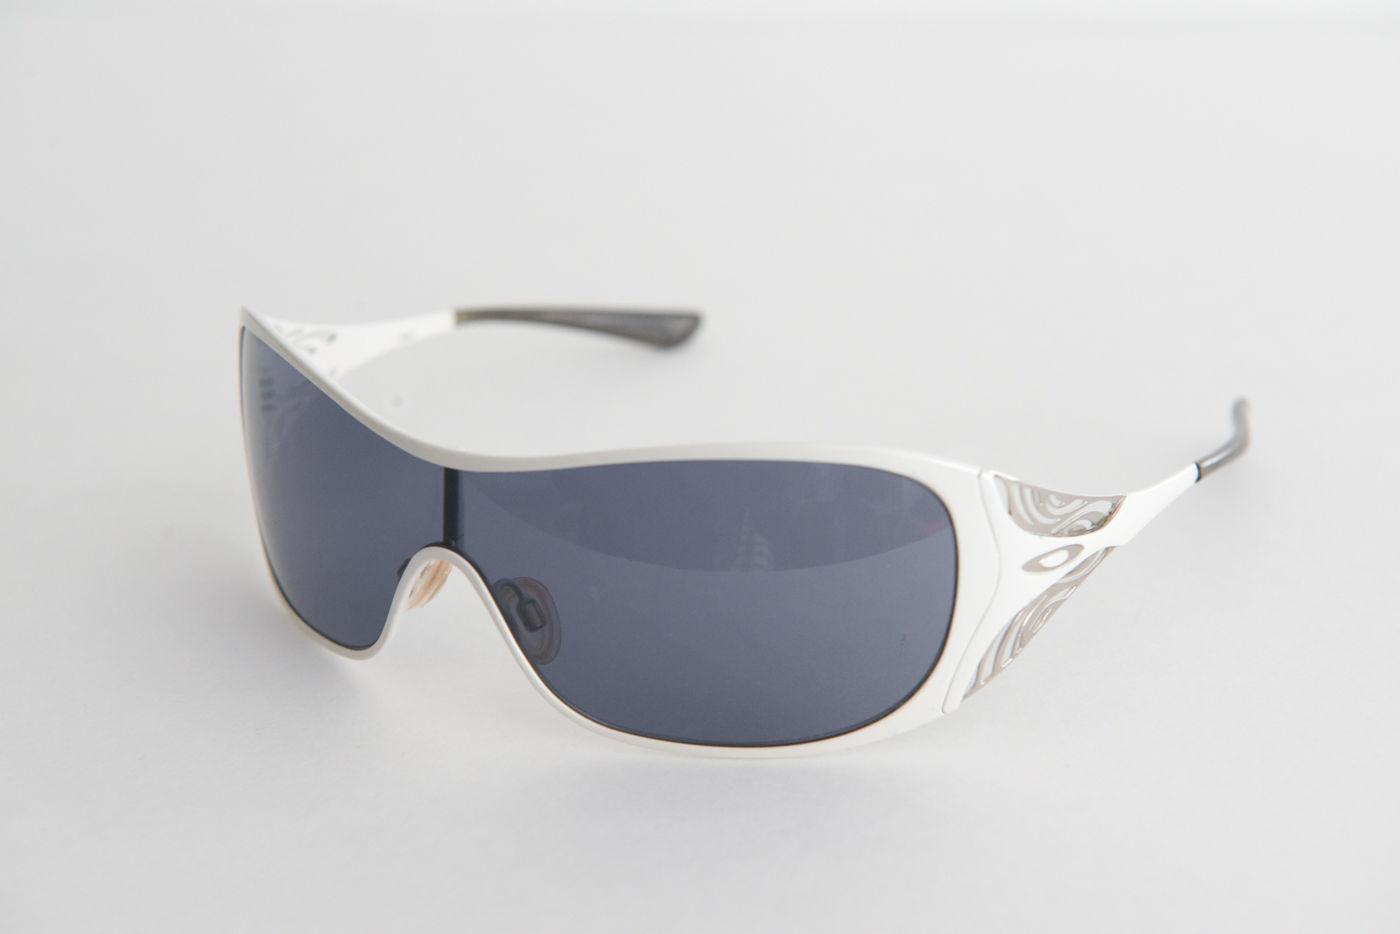 2568d3c6f8b Replacement Lens For Oakley Liv Sunglasses